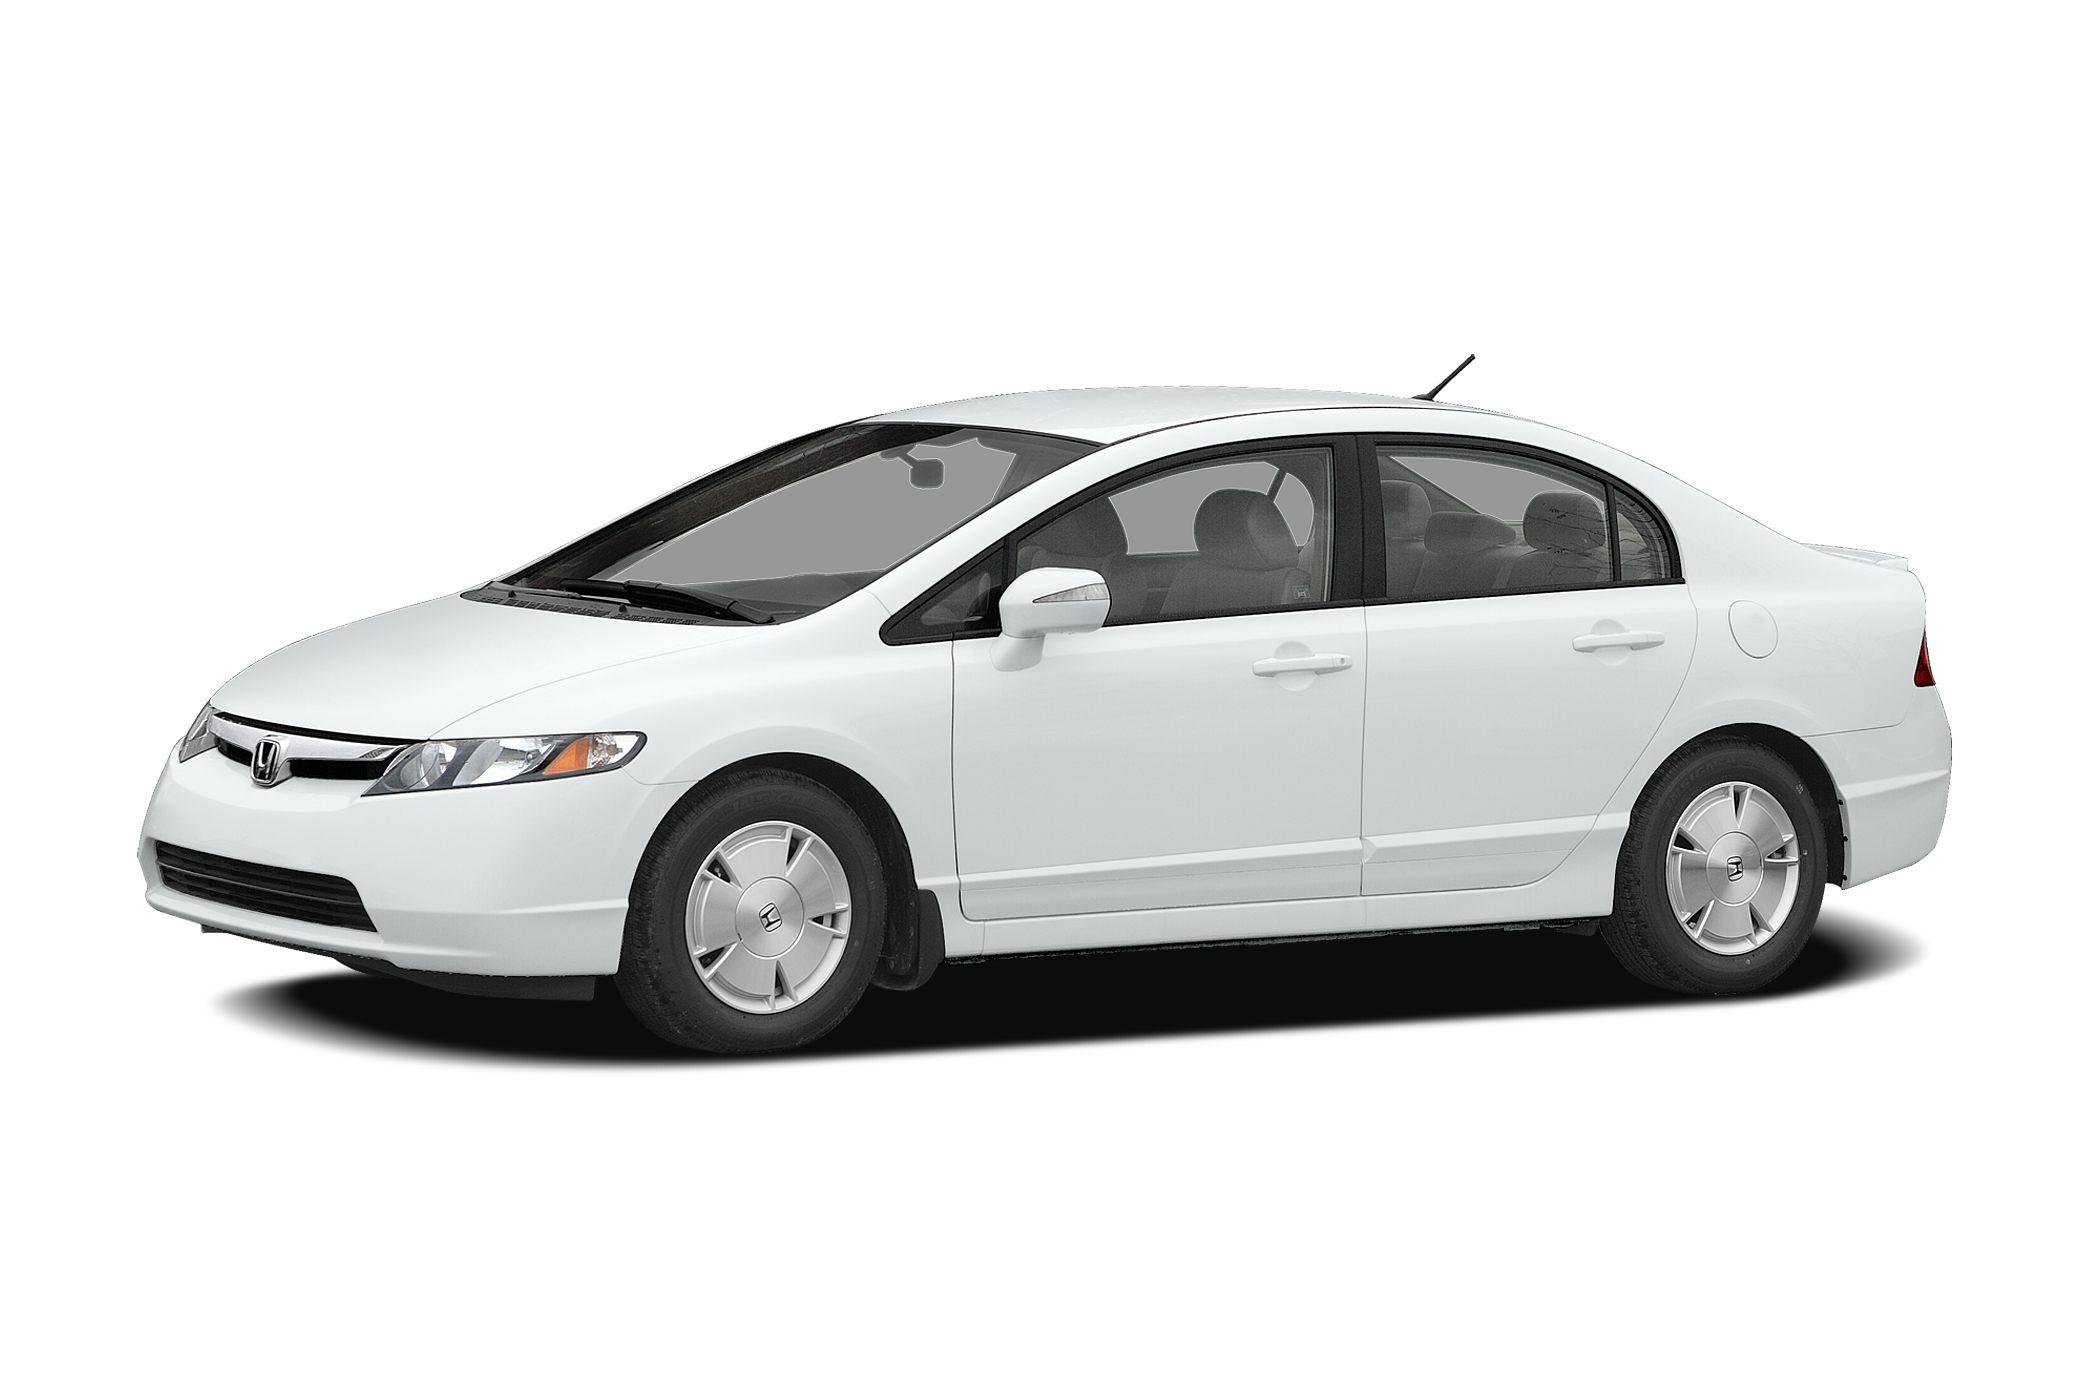 2008 Honda Civic Hybrid Sedan for sale in Fairfax for $8,998 with 99,327 miles.